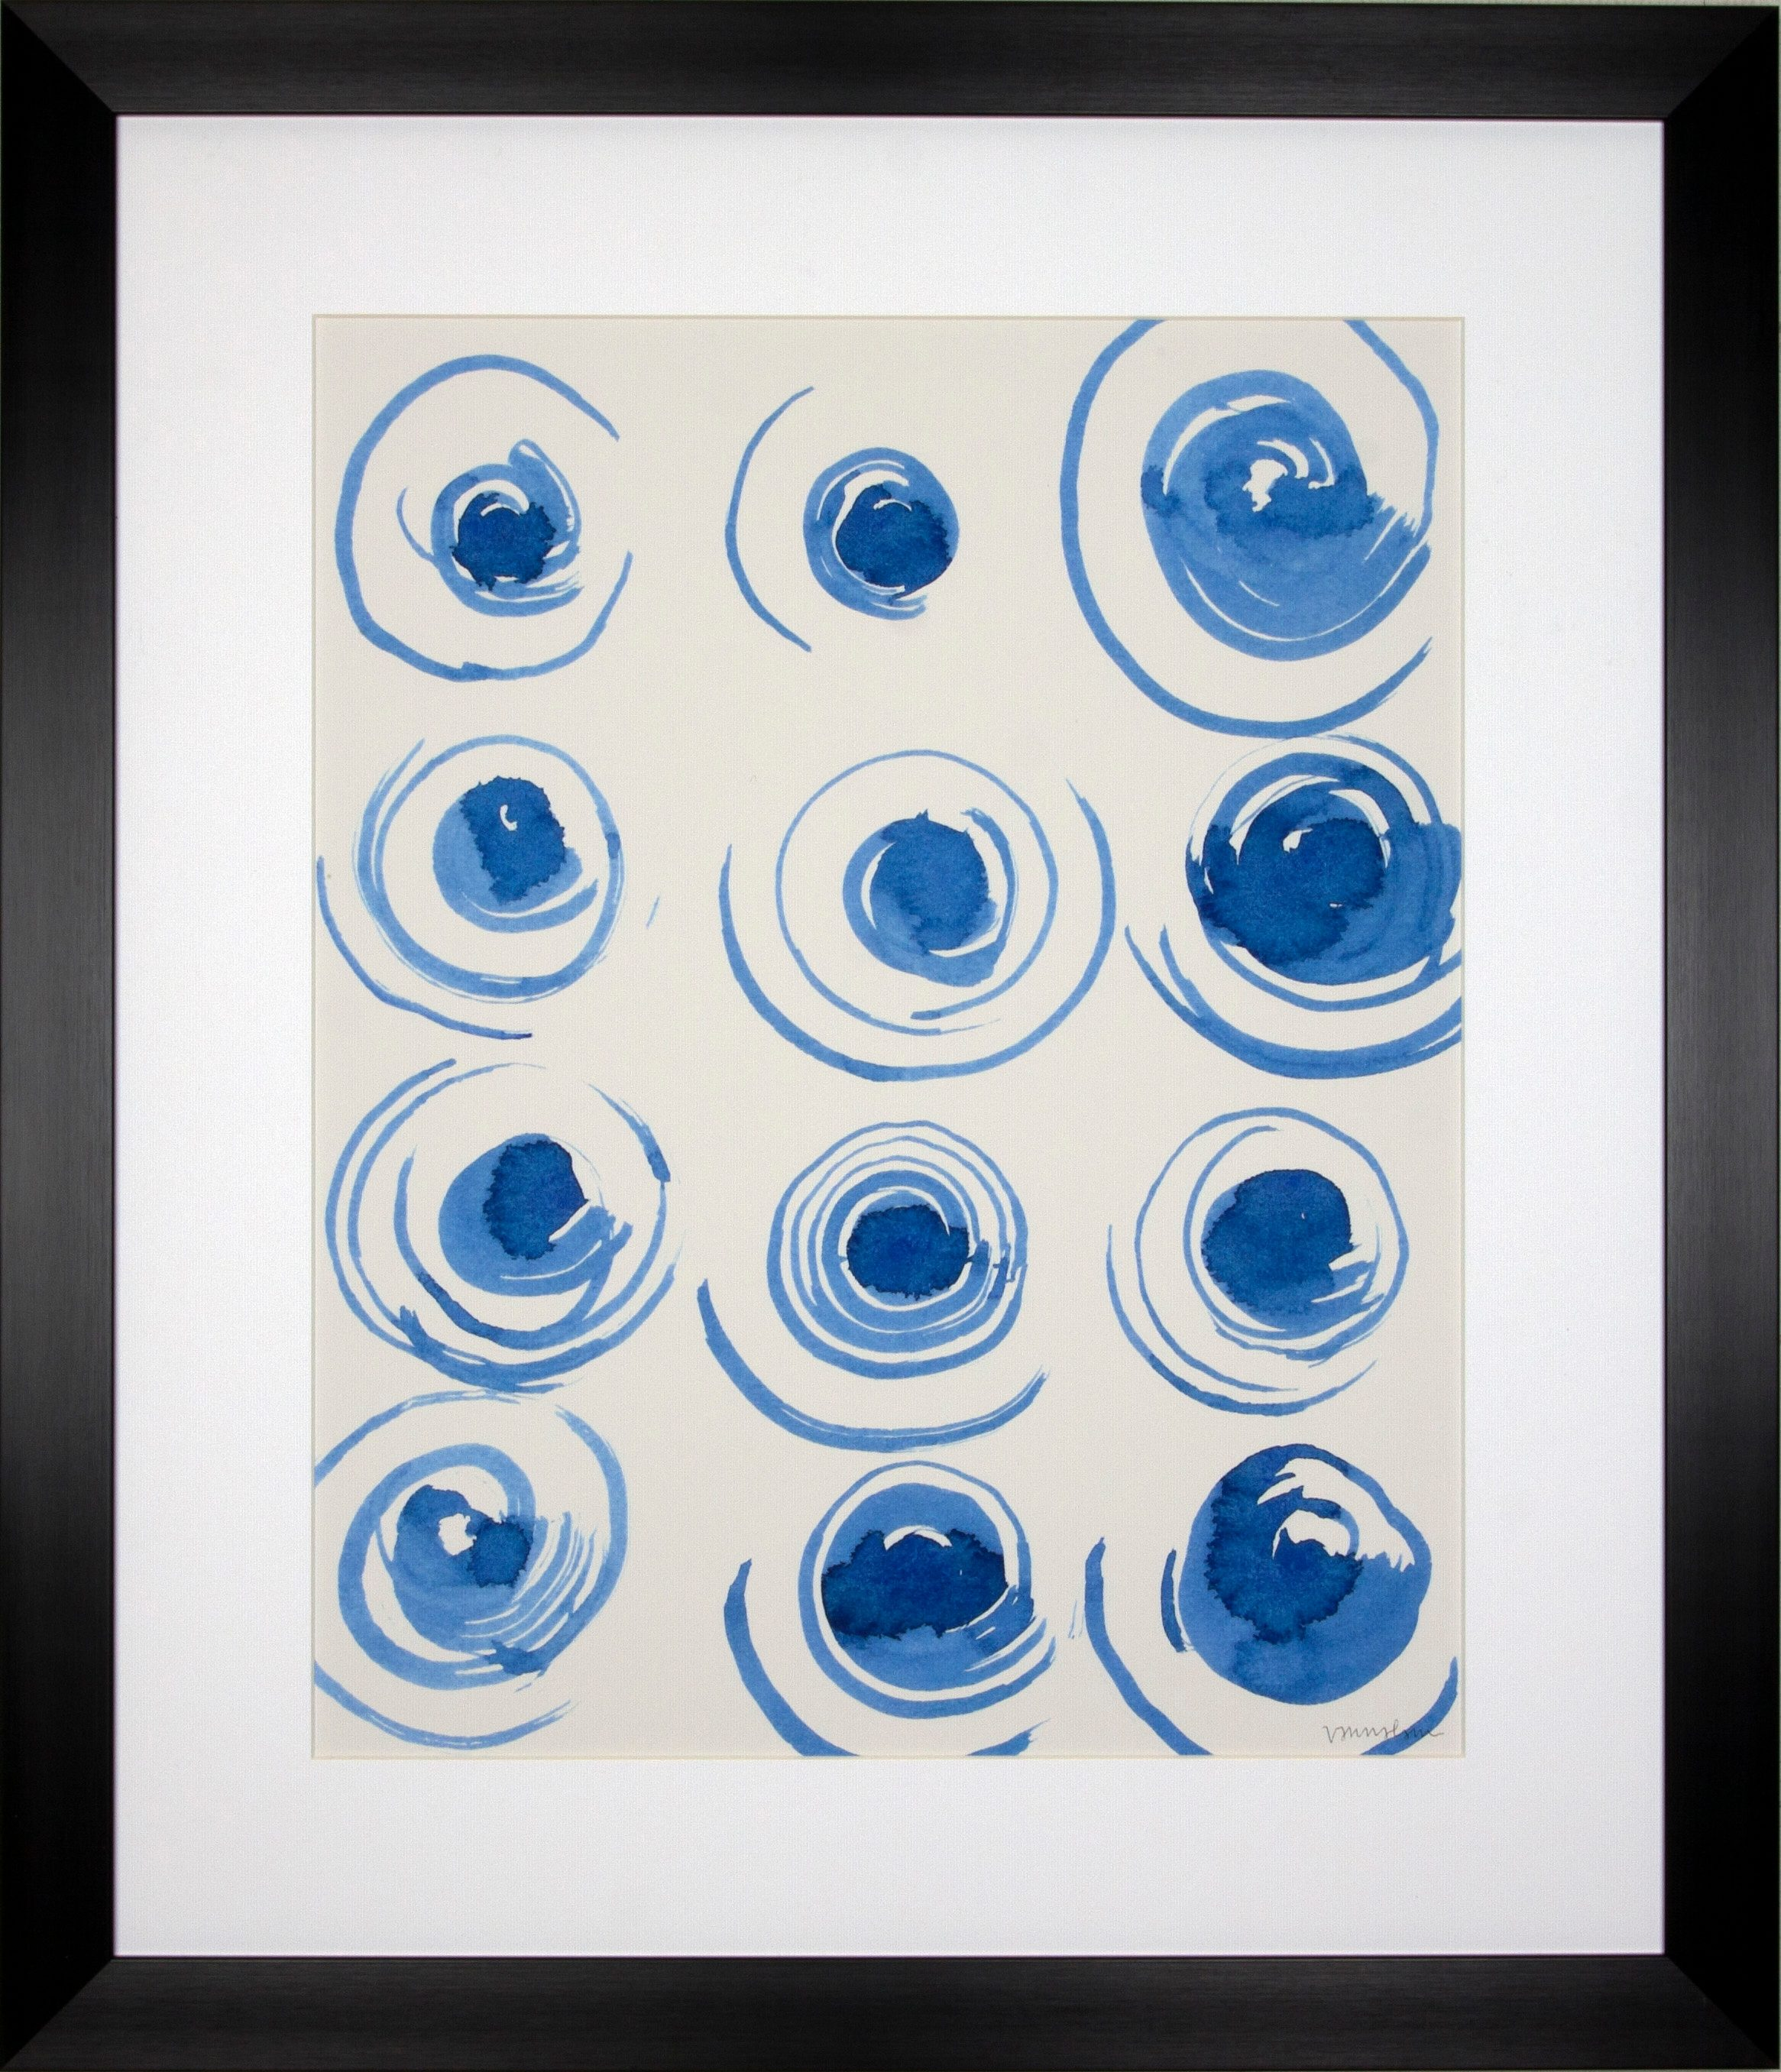 G&C gerahmter Kunstdruck »Lam: Macrame Blue Motiv 3«, 55/65 cm